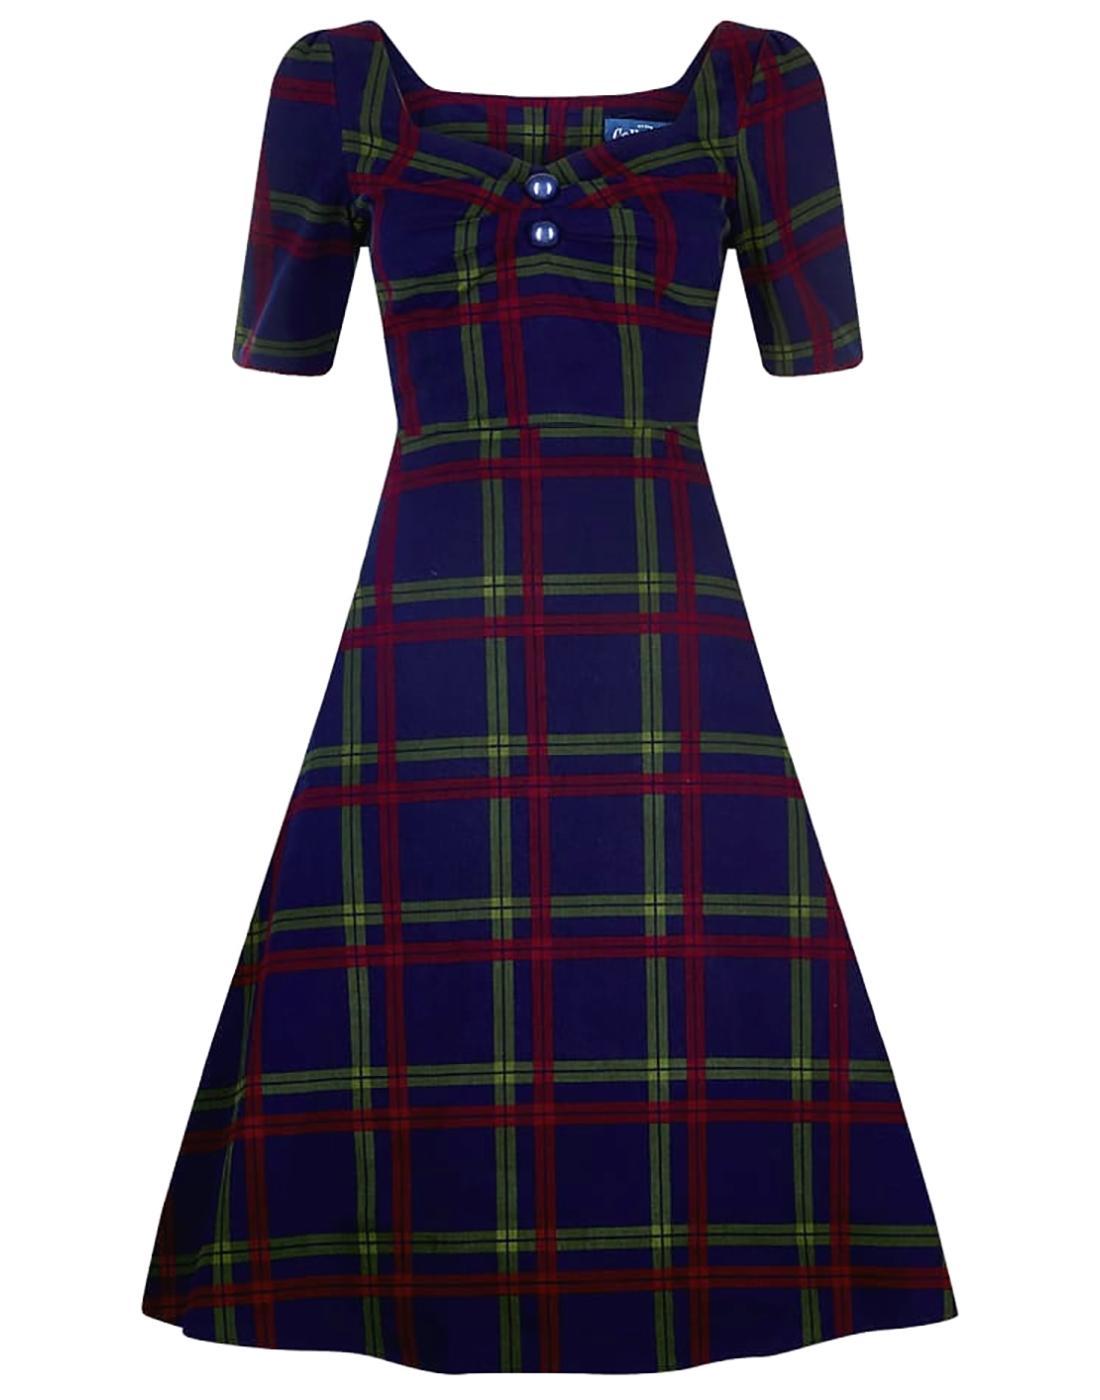 Dolores Darling COLLECTIF Retro Check Doll Dress